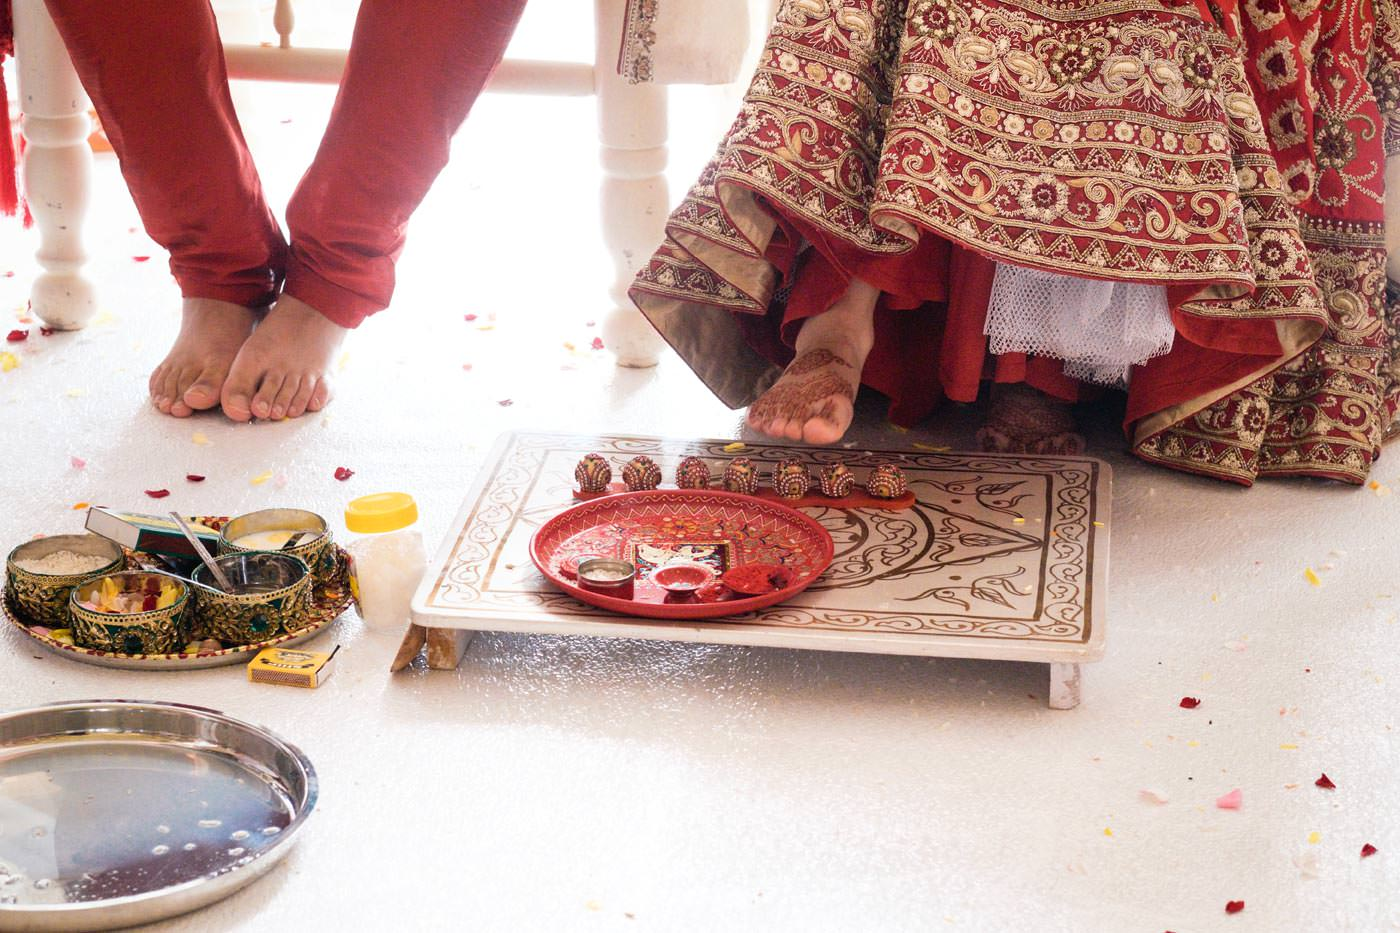 Hindu ceremony moment at Ragley Hall